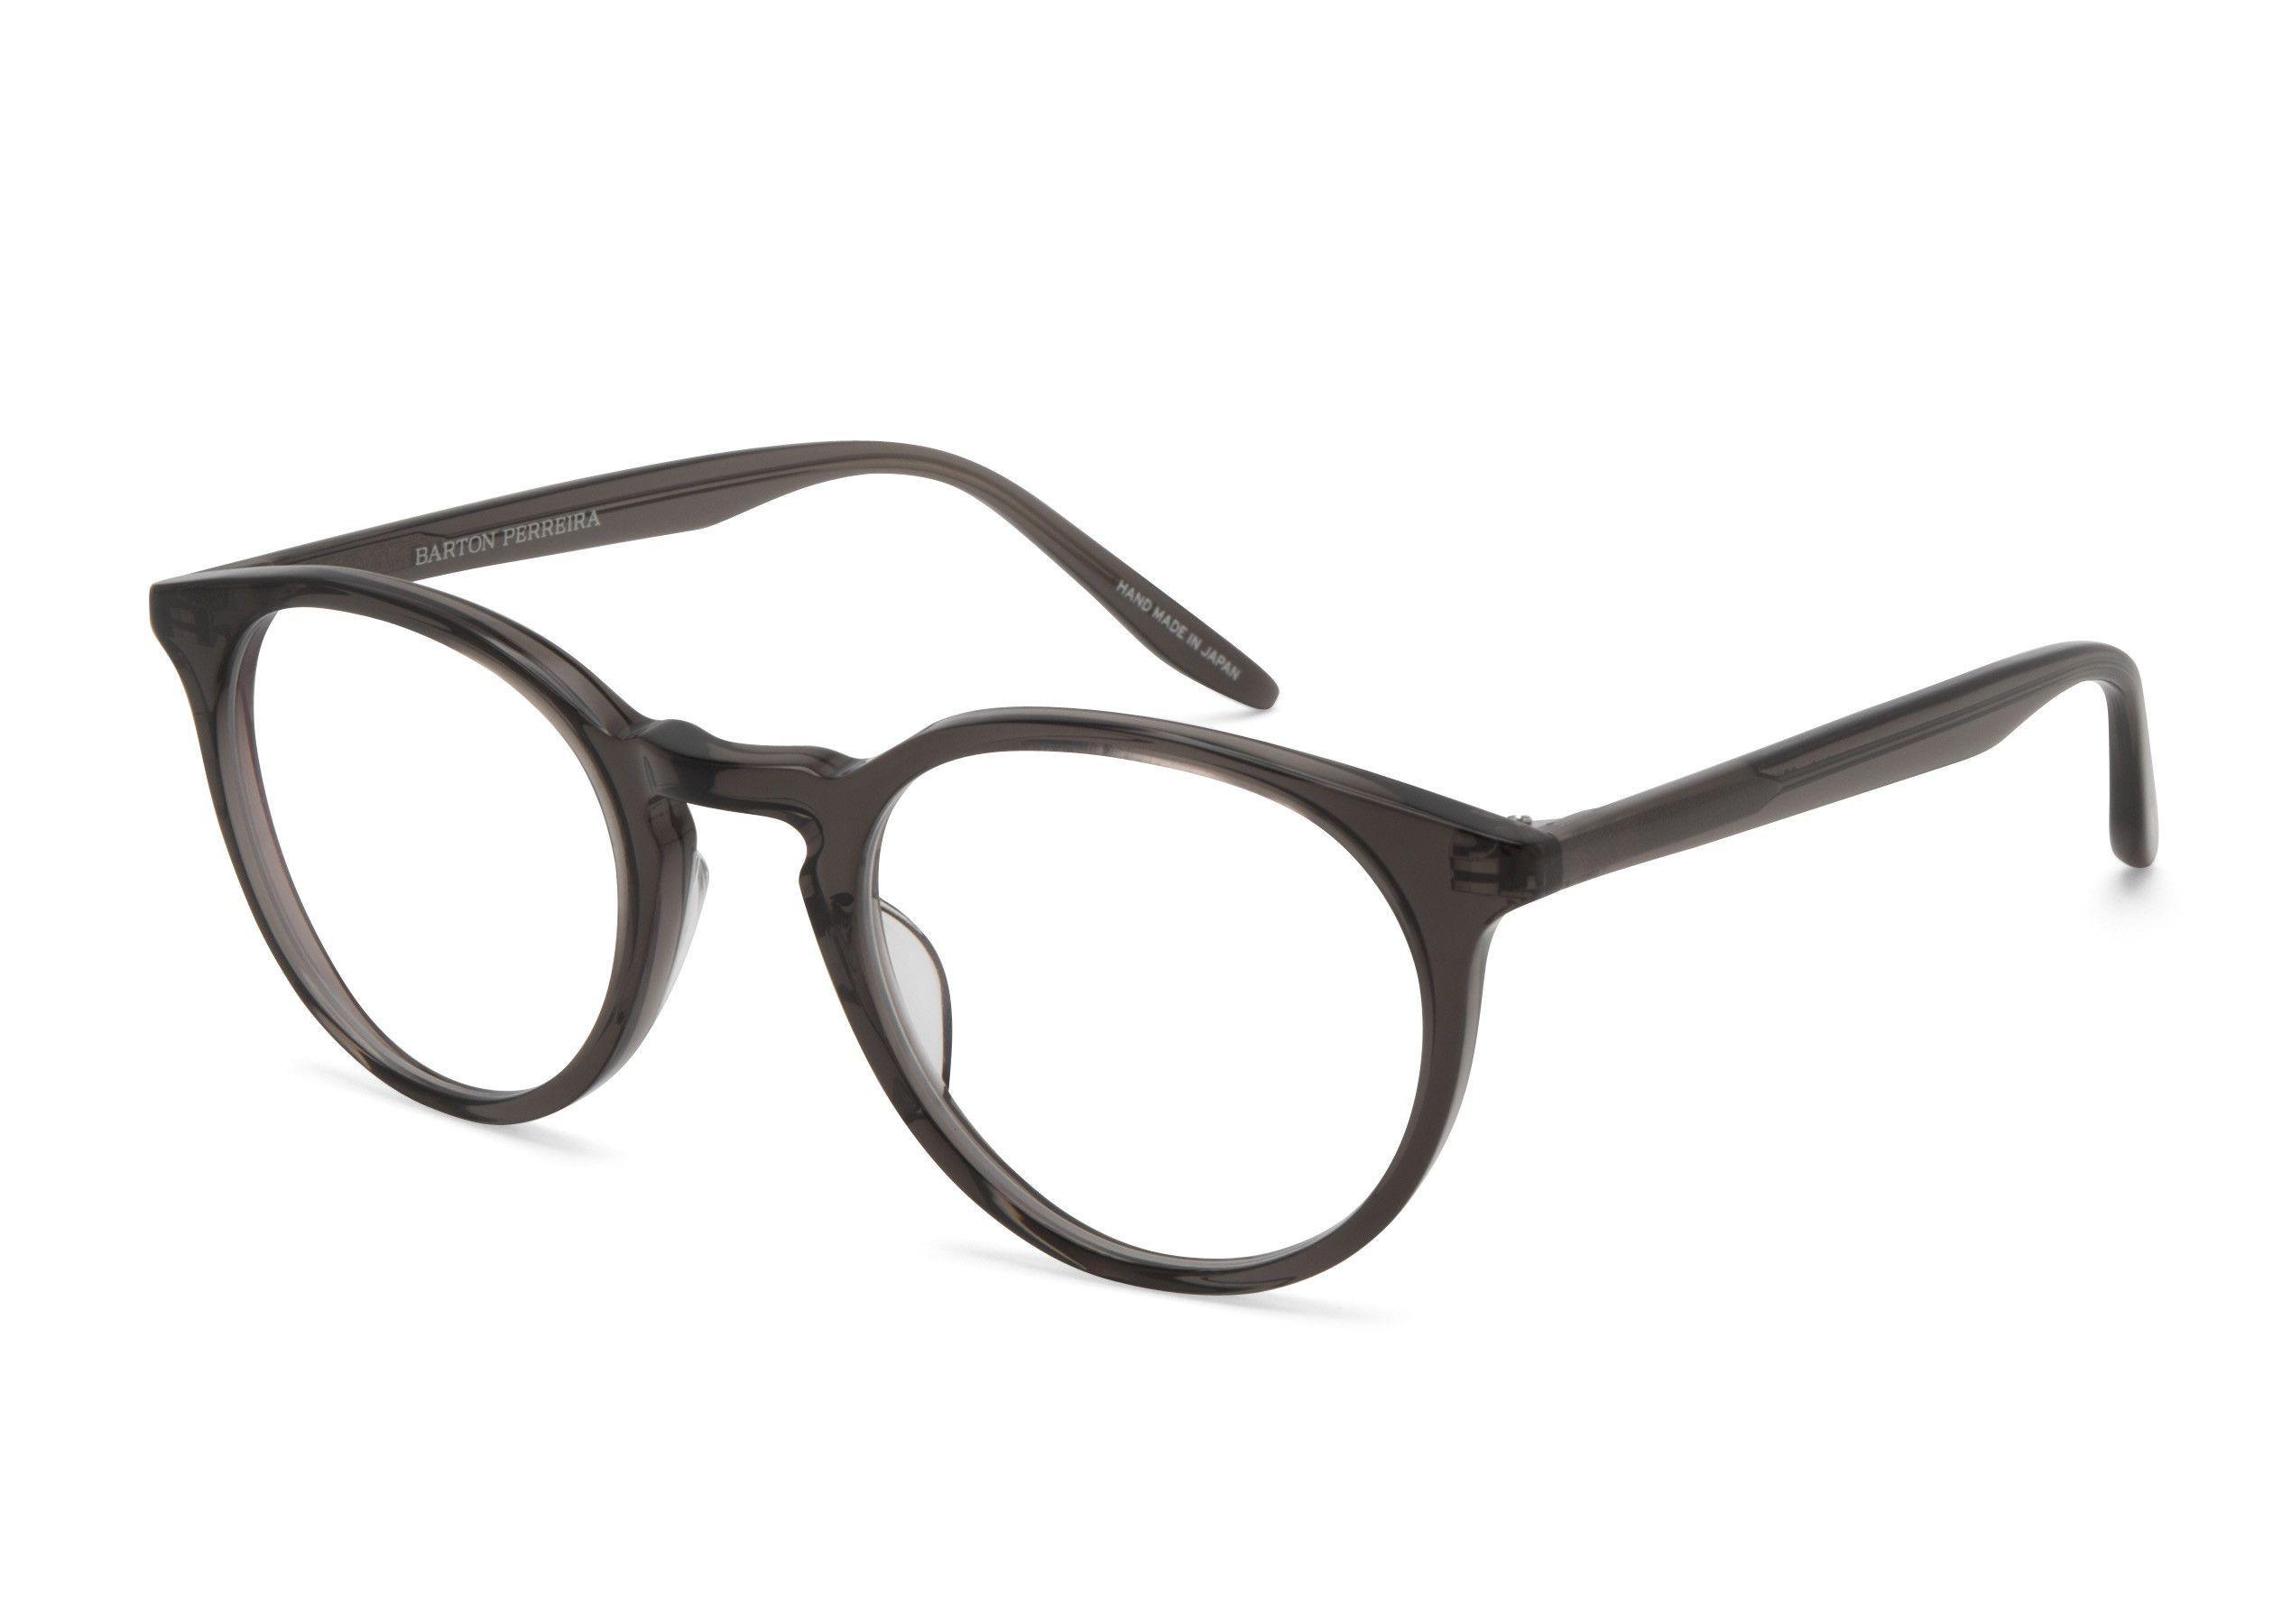 PRINCETON ROUND-FRAME GREY Prescription Glasses | Pinterest